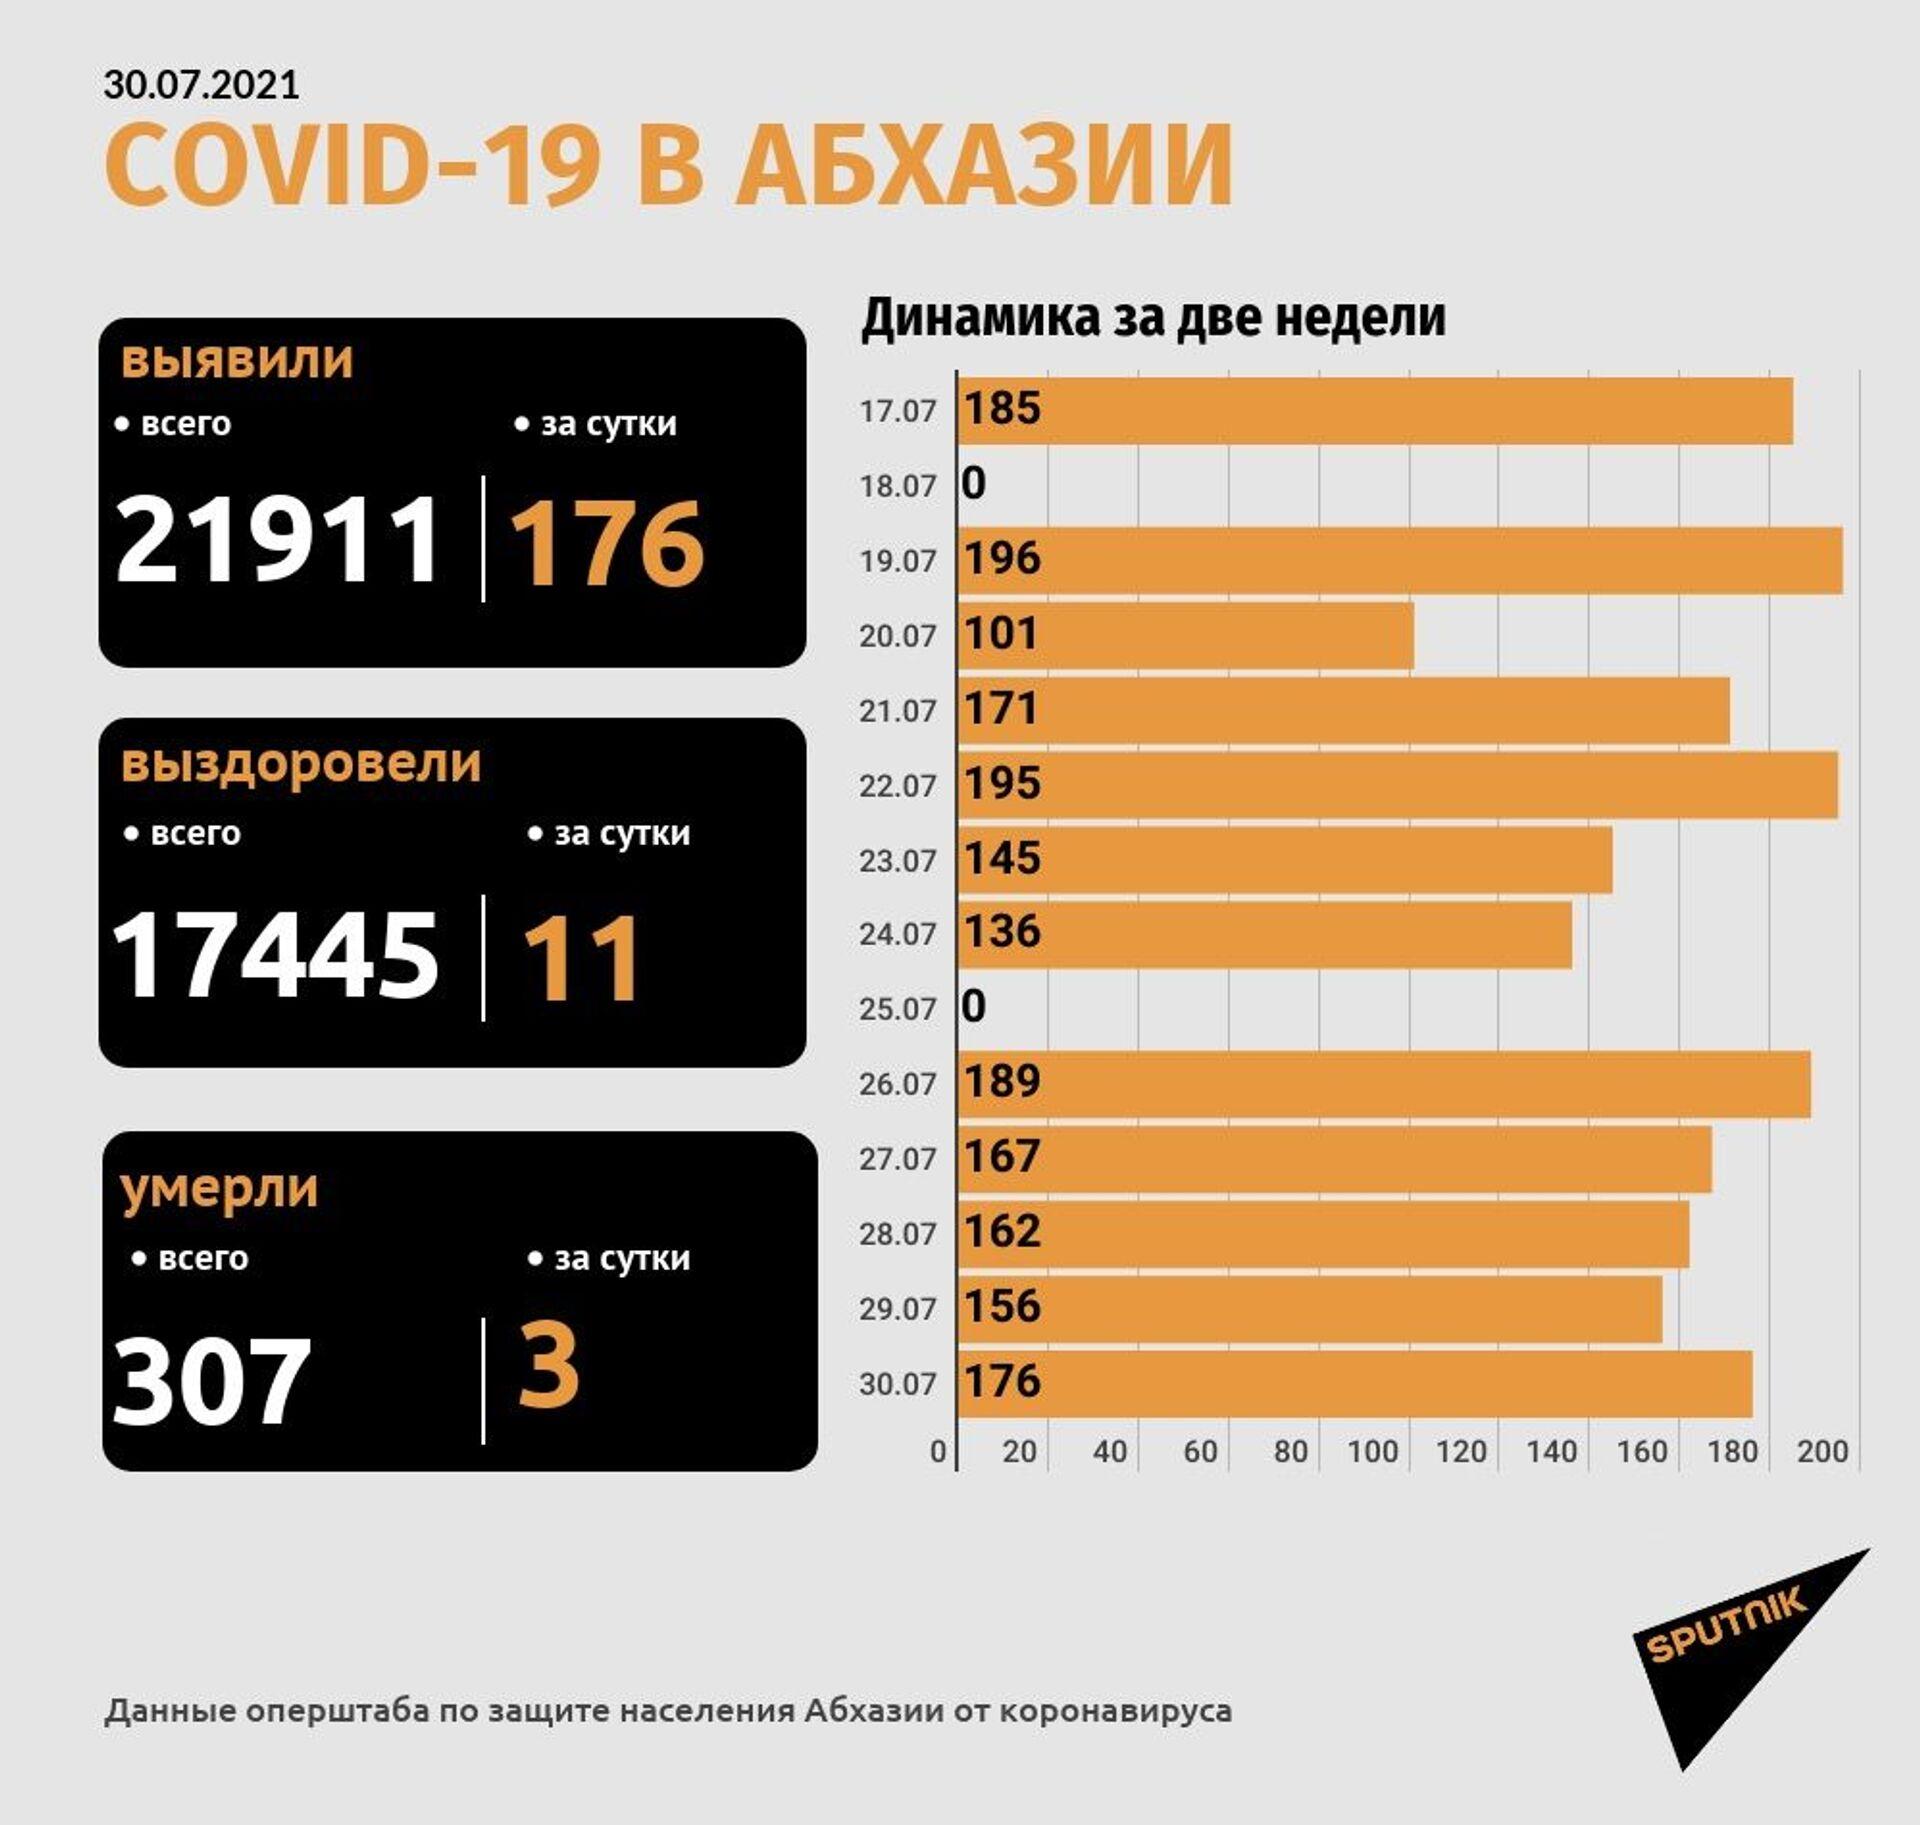 Три пациента с COVID-19 скончались в Гудаутском госпитале  - Sputnik Абхазия, 1920, 30.07.2021